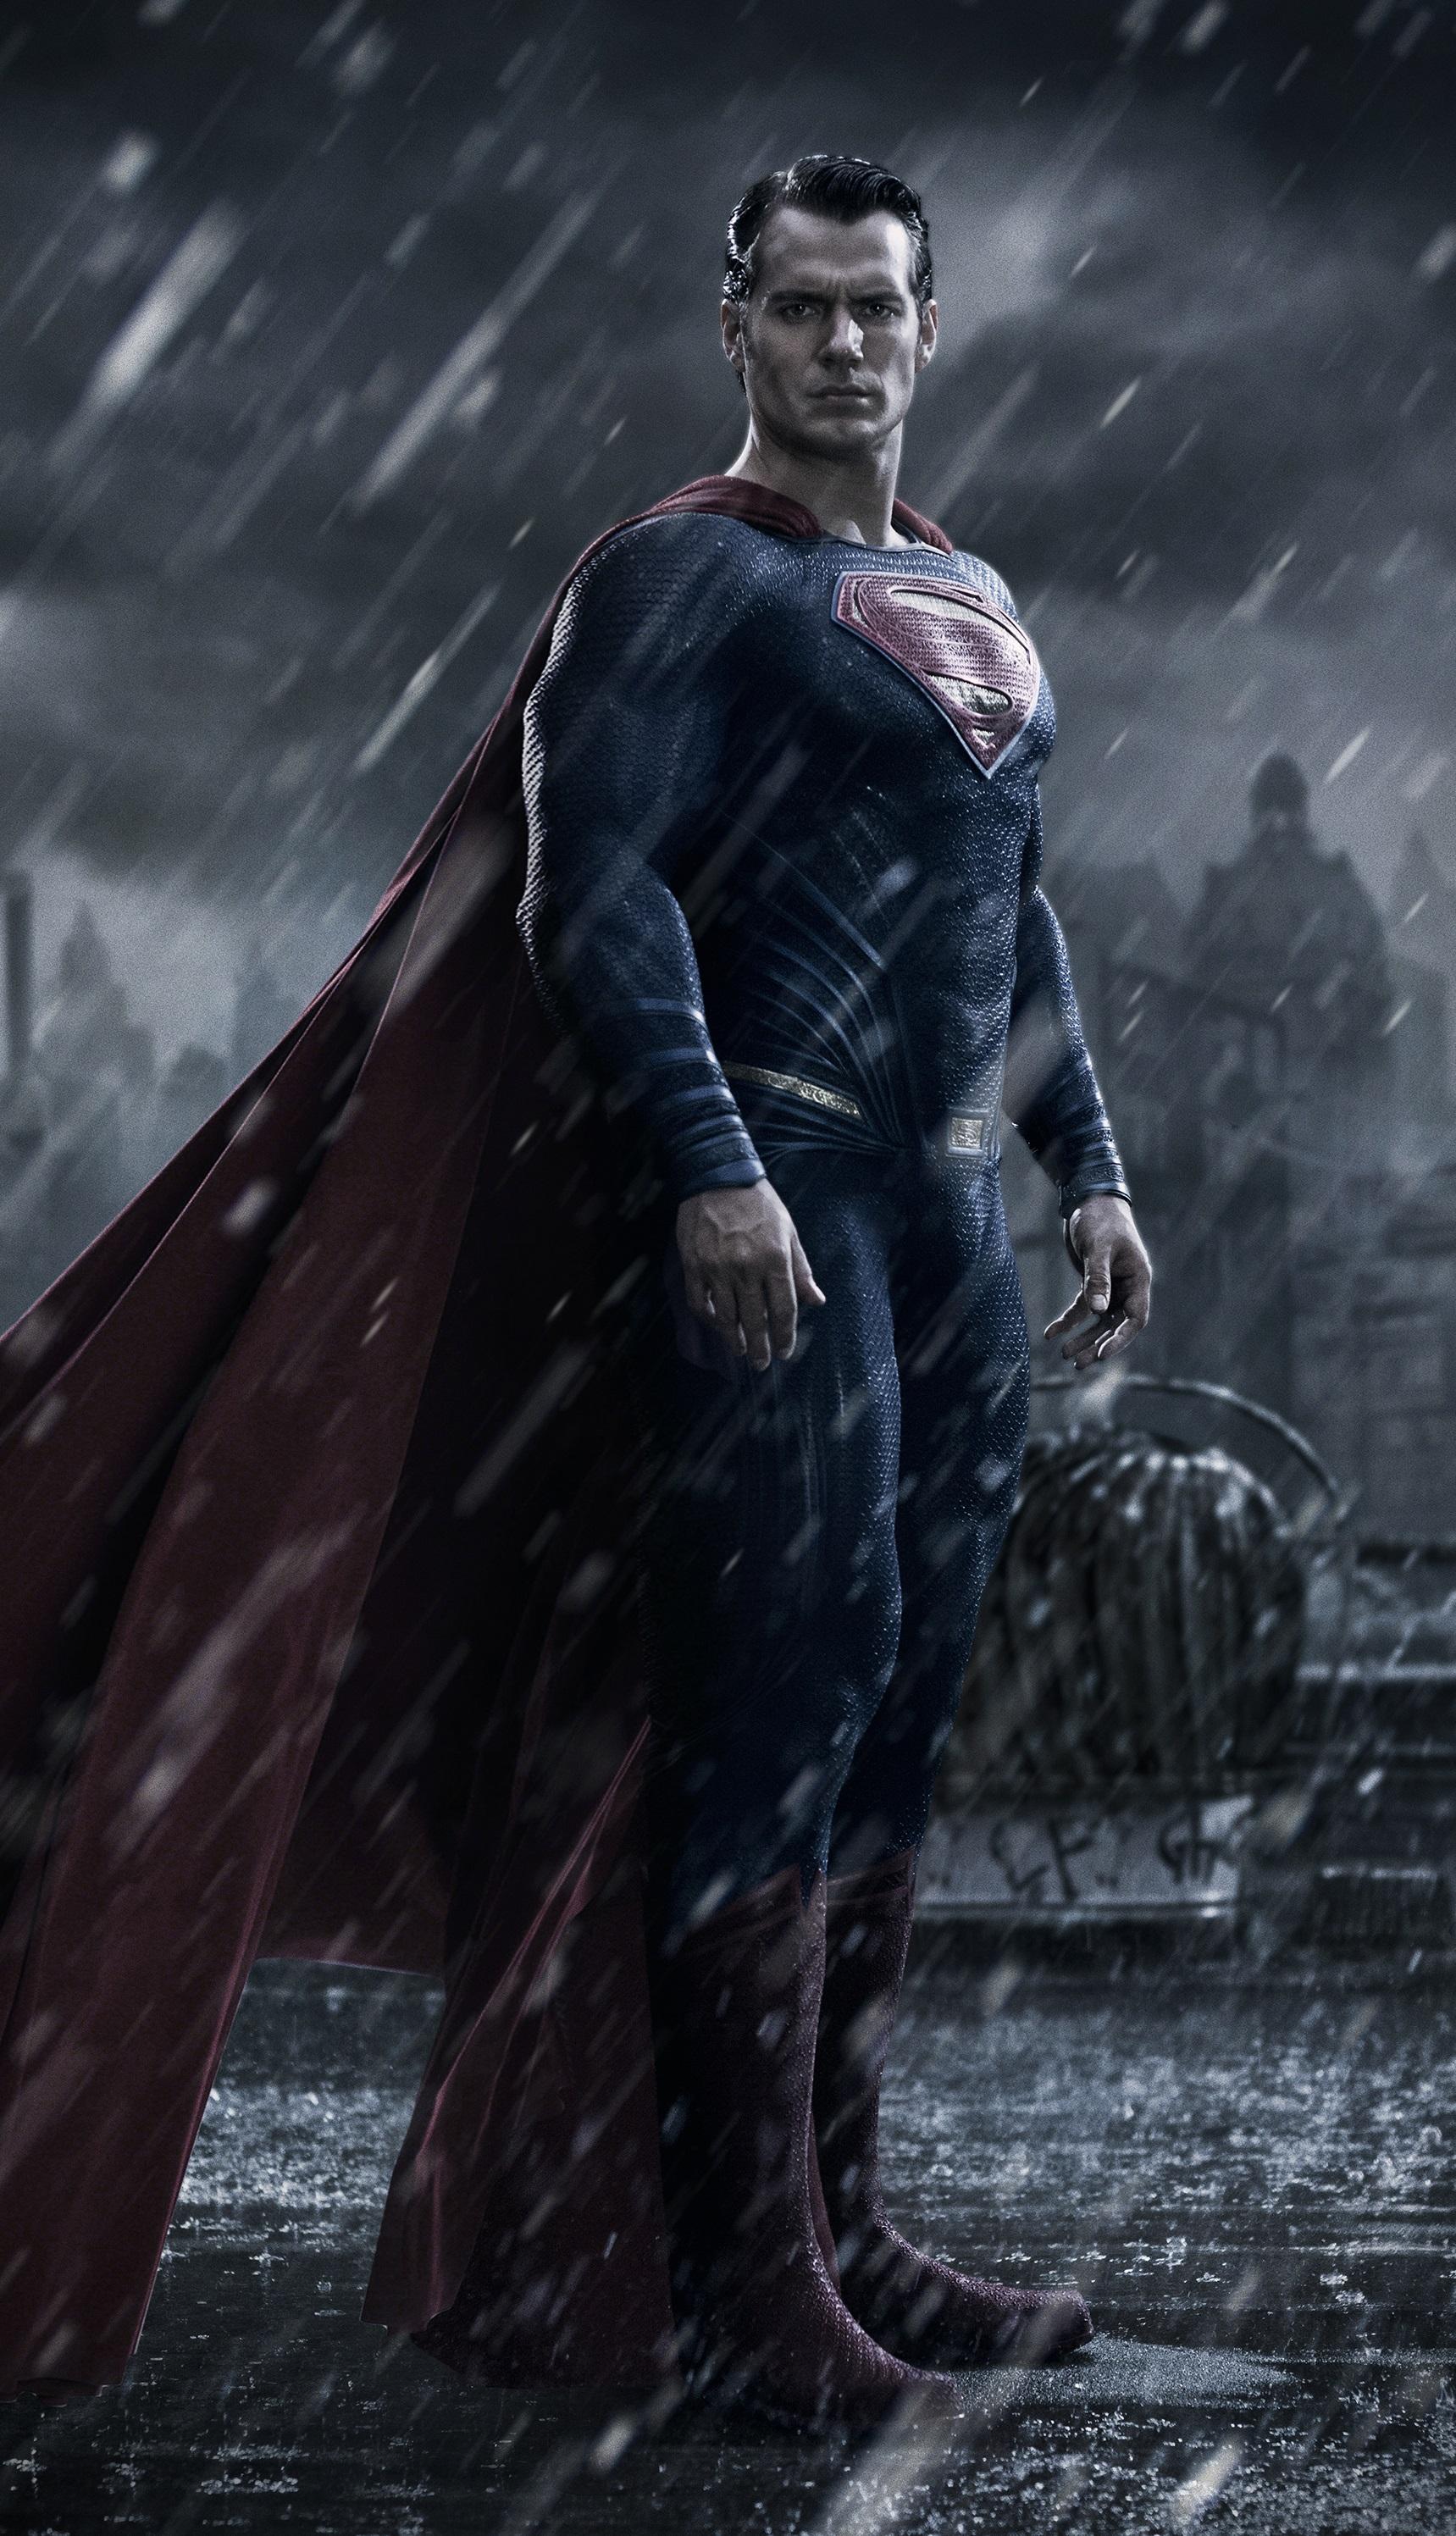 Kal-El (Universo Estendido da DC)